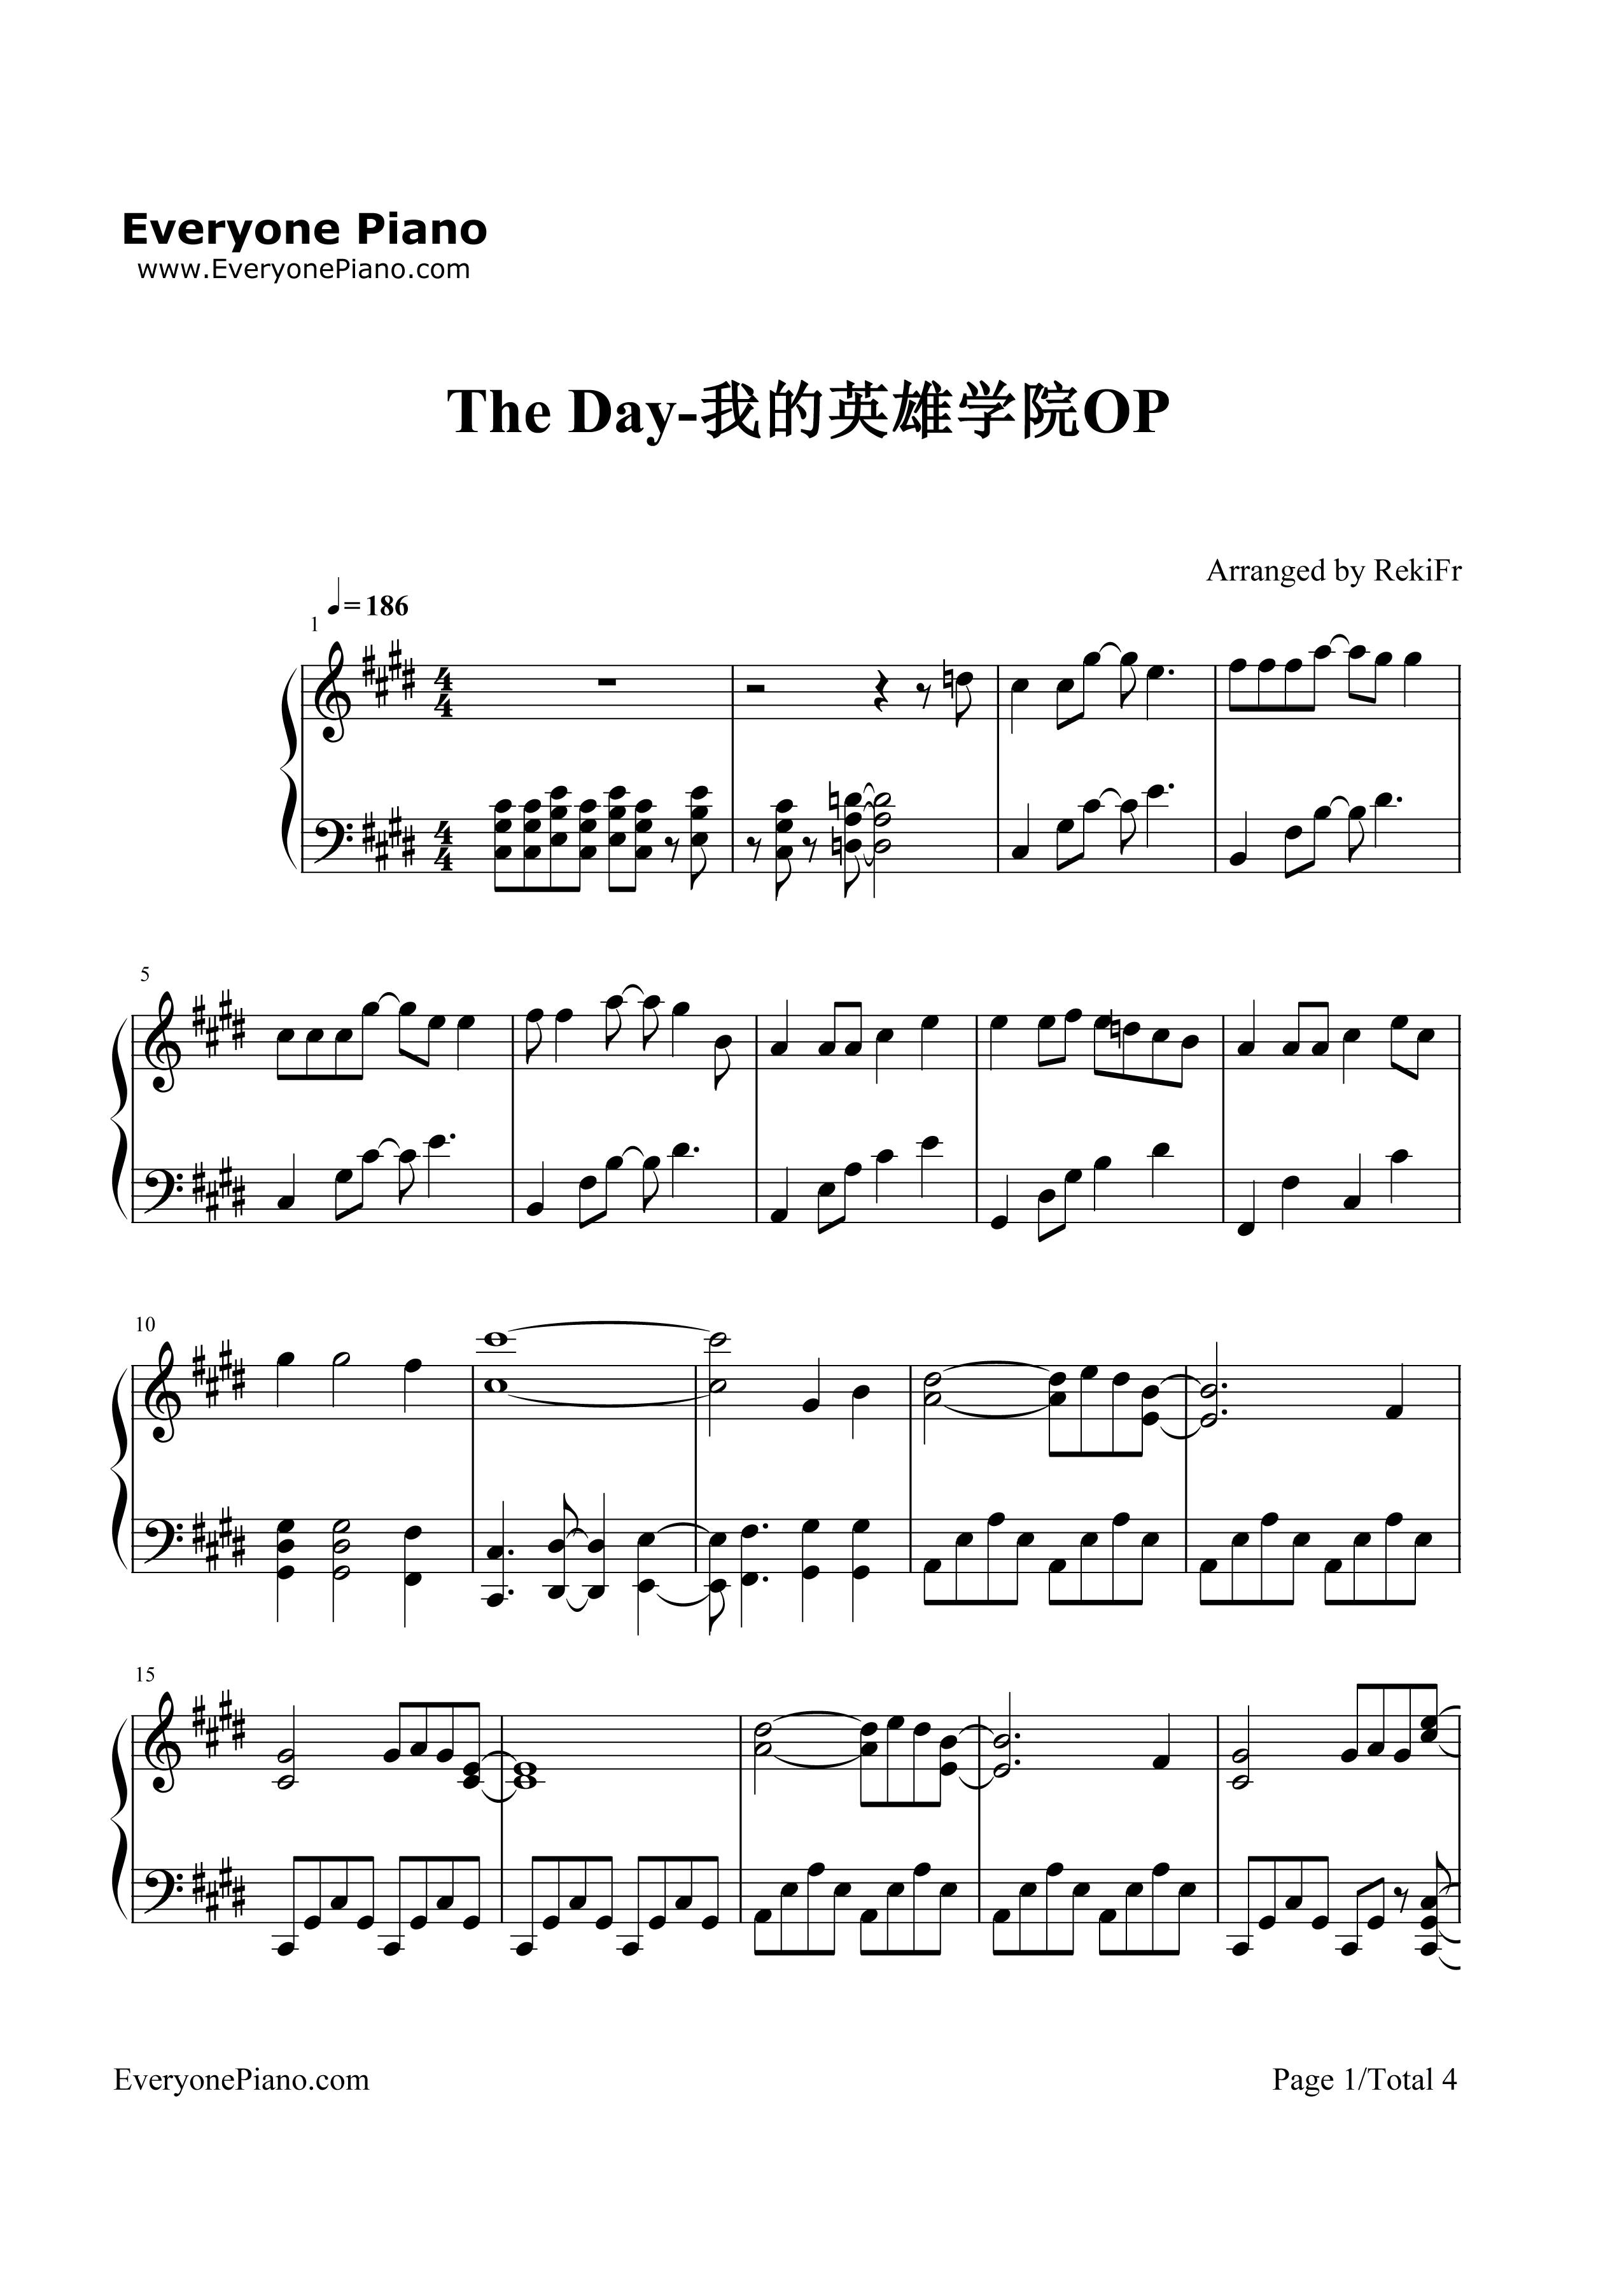 The Day-僕のヒーロー アカデミアOP五線譜プレビュー1